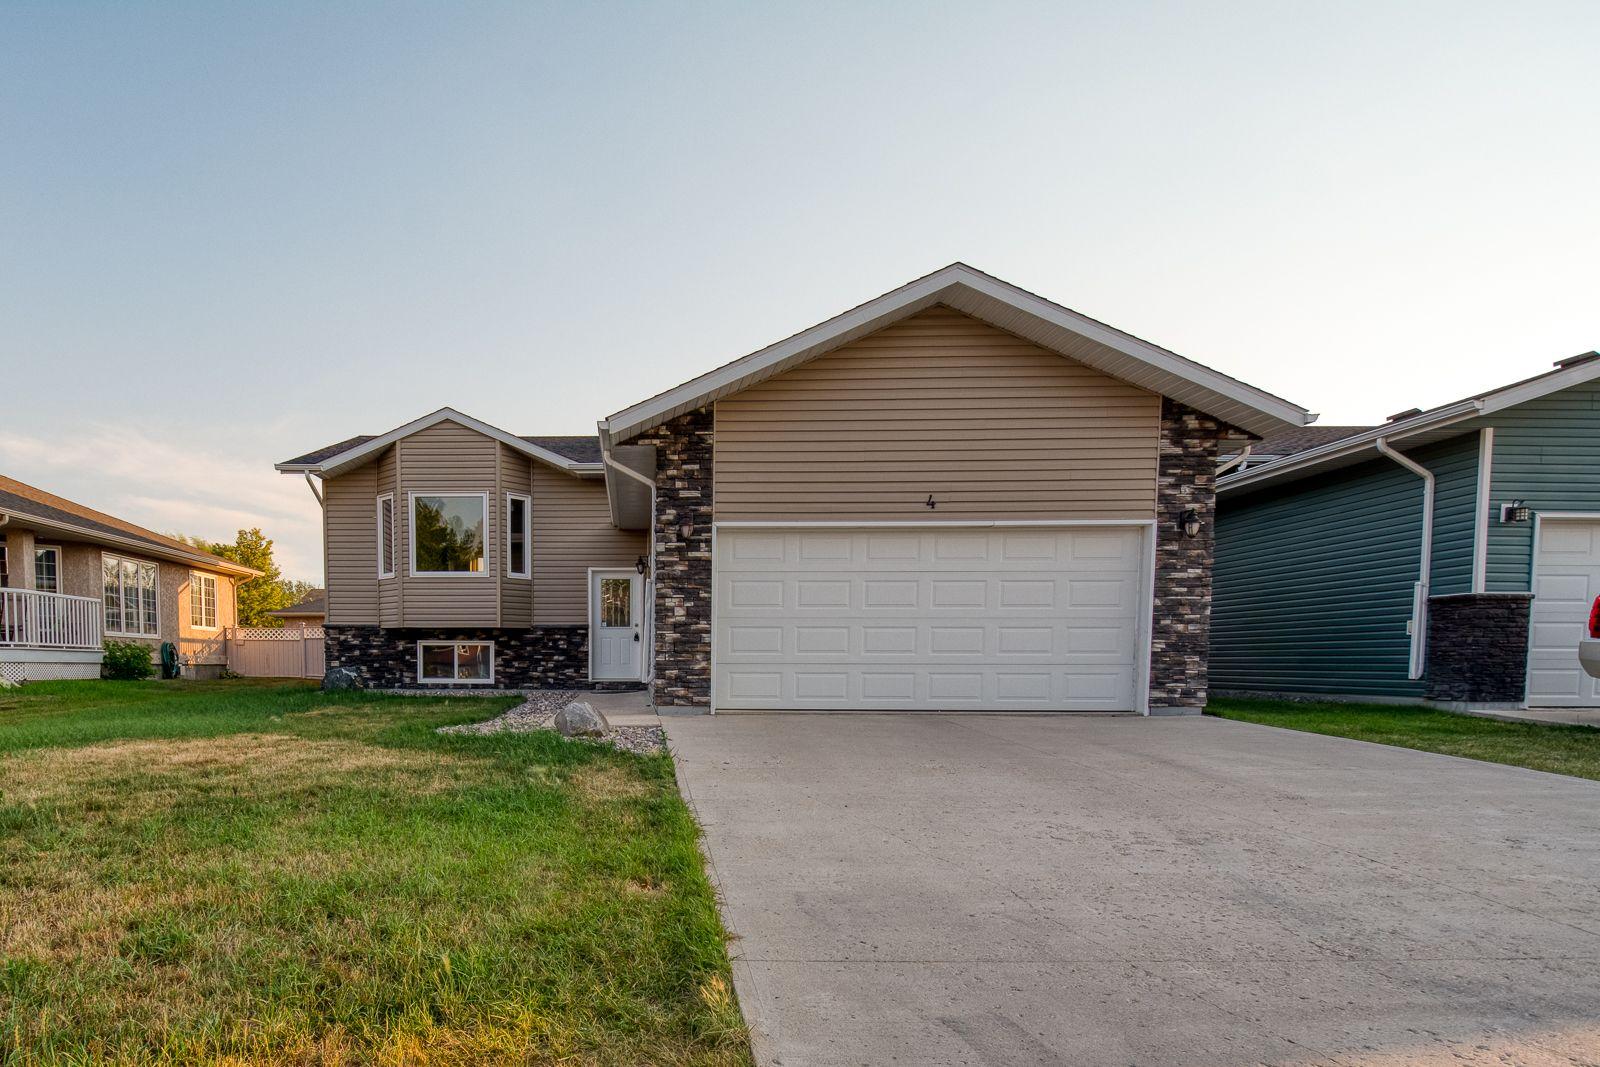 Main Photo: 4 Kelly K Street in Portage la Prairie: House for sale : MLS®# 202107921